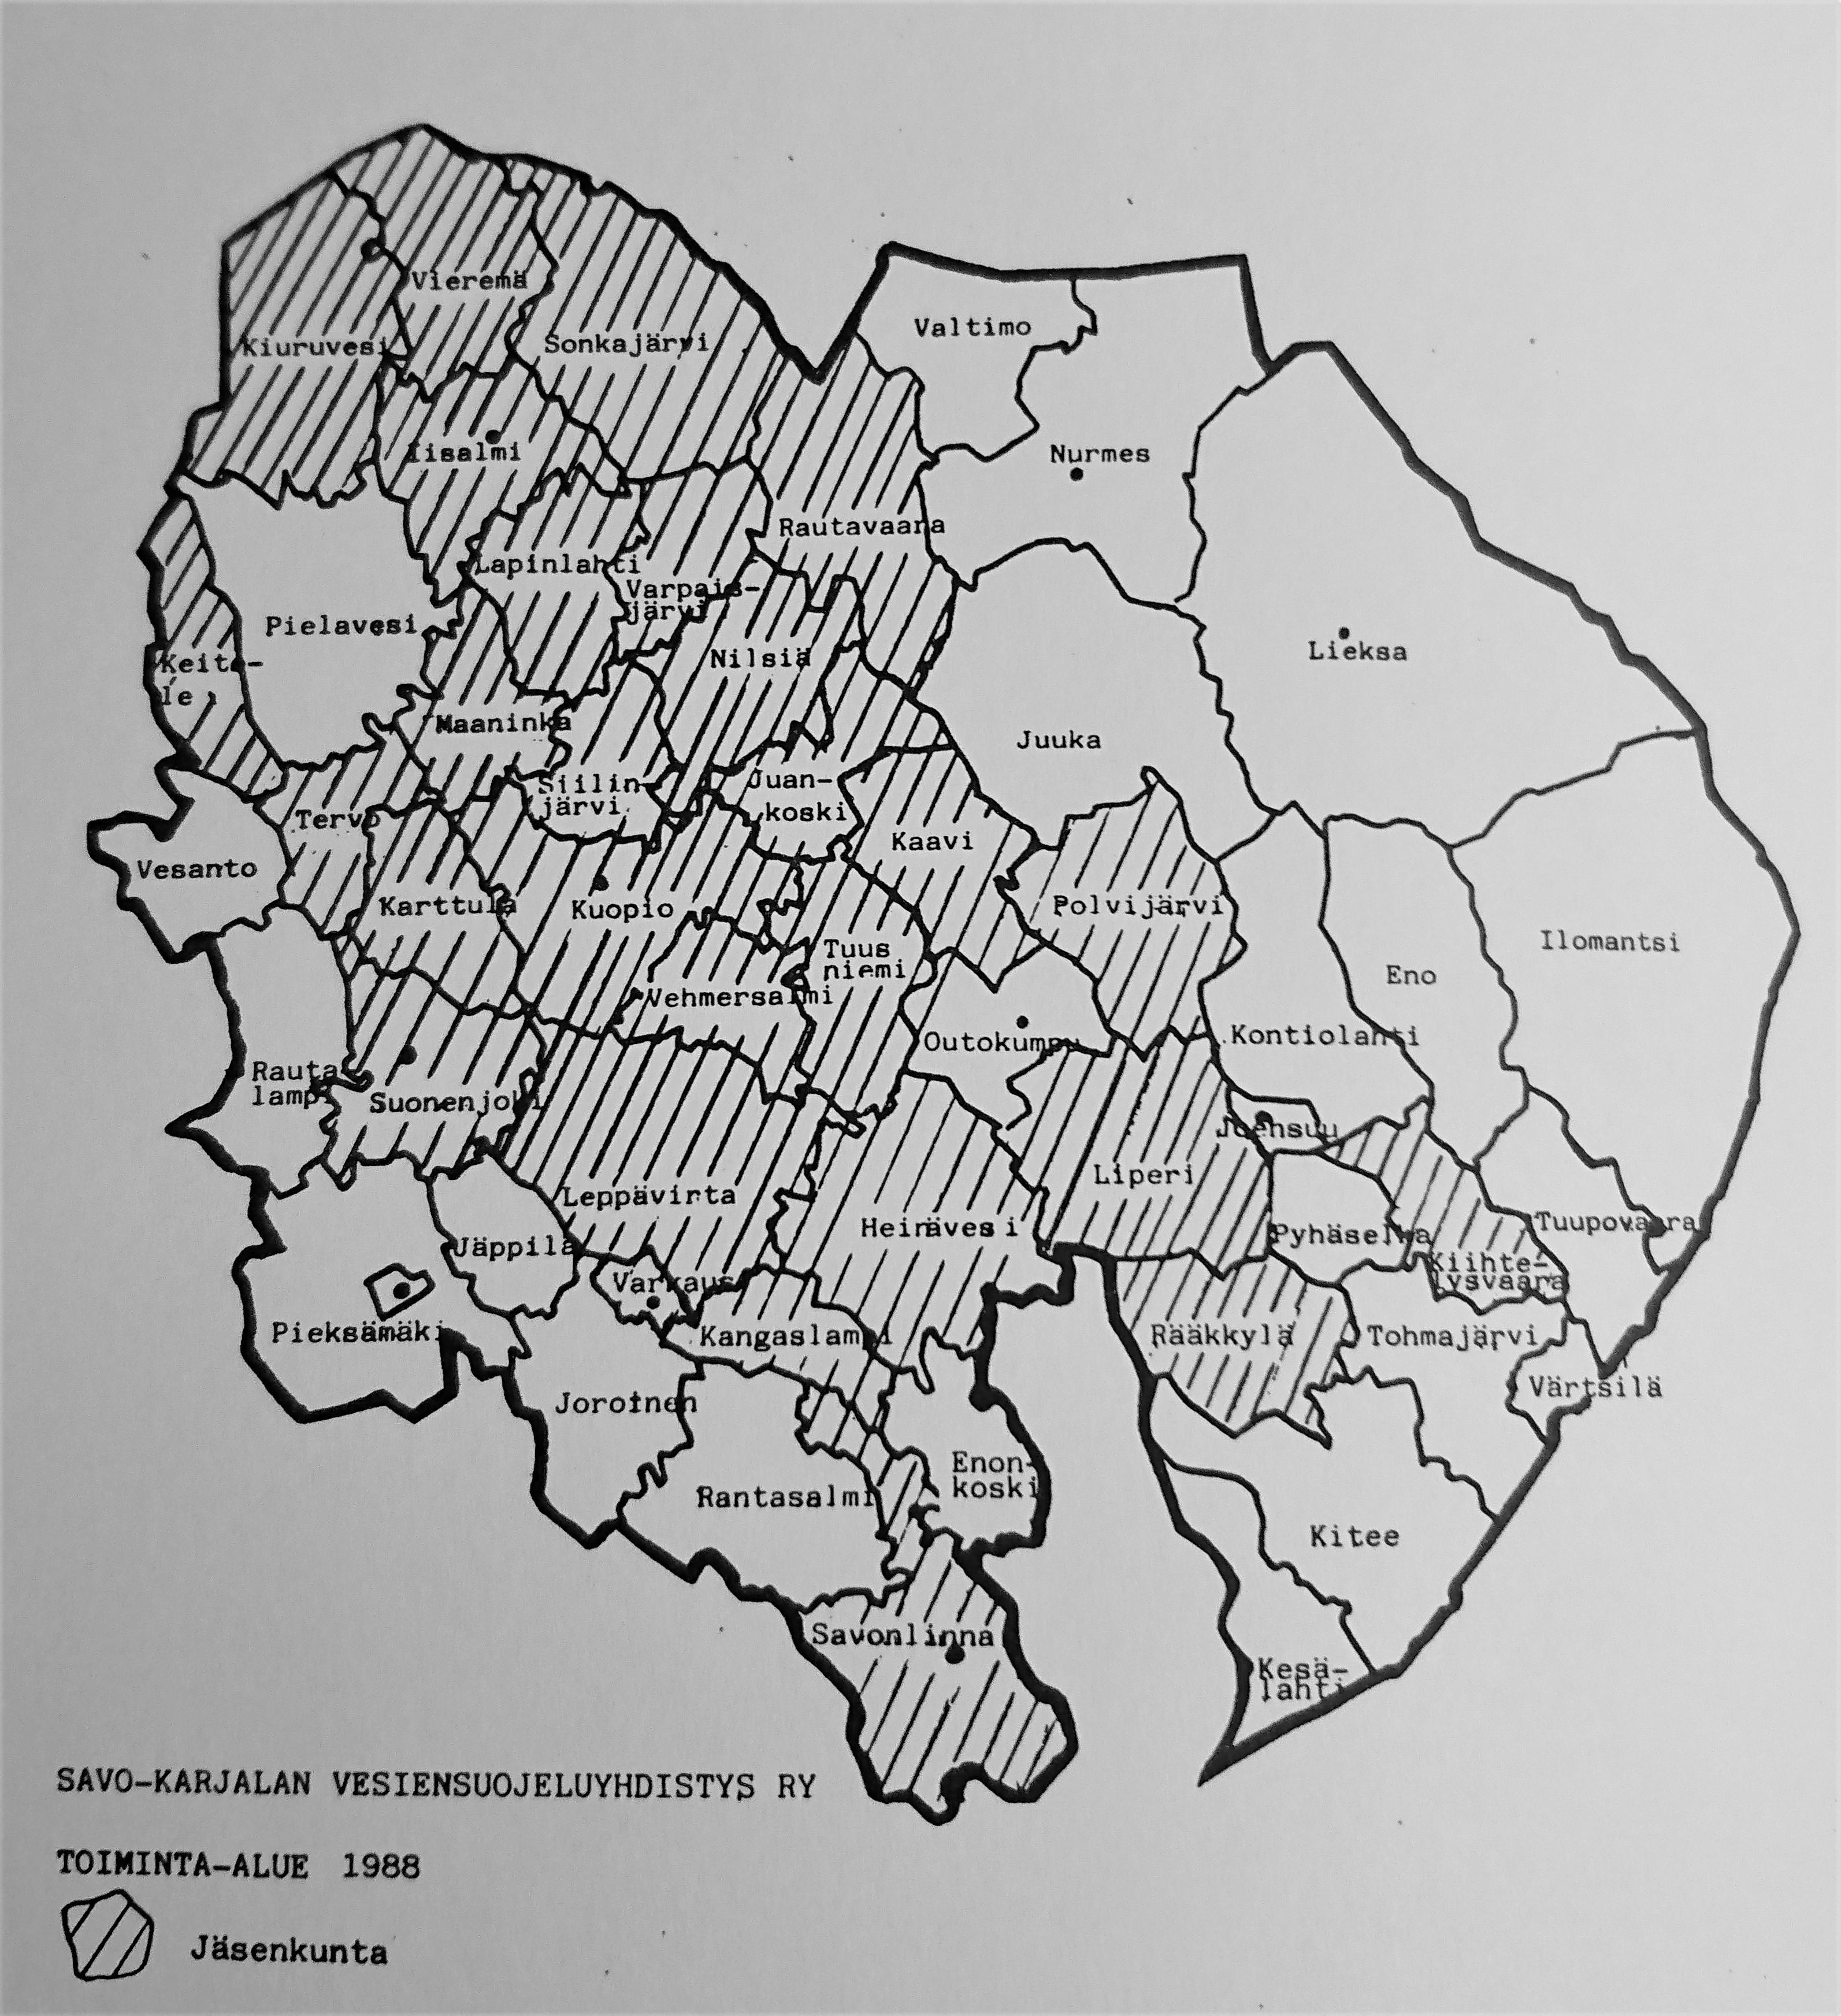 Toiminta-alue 1988